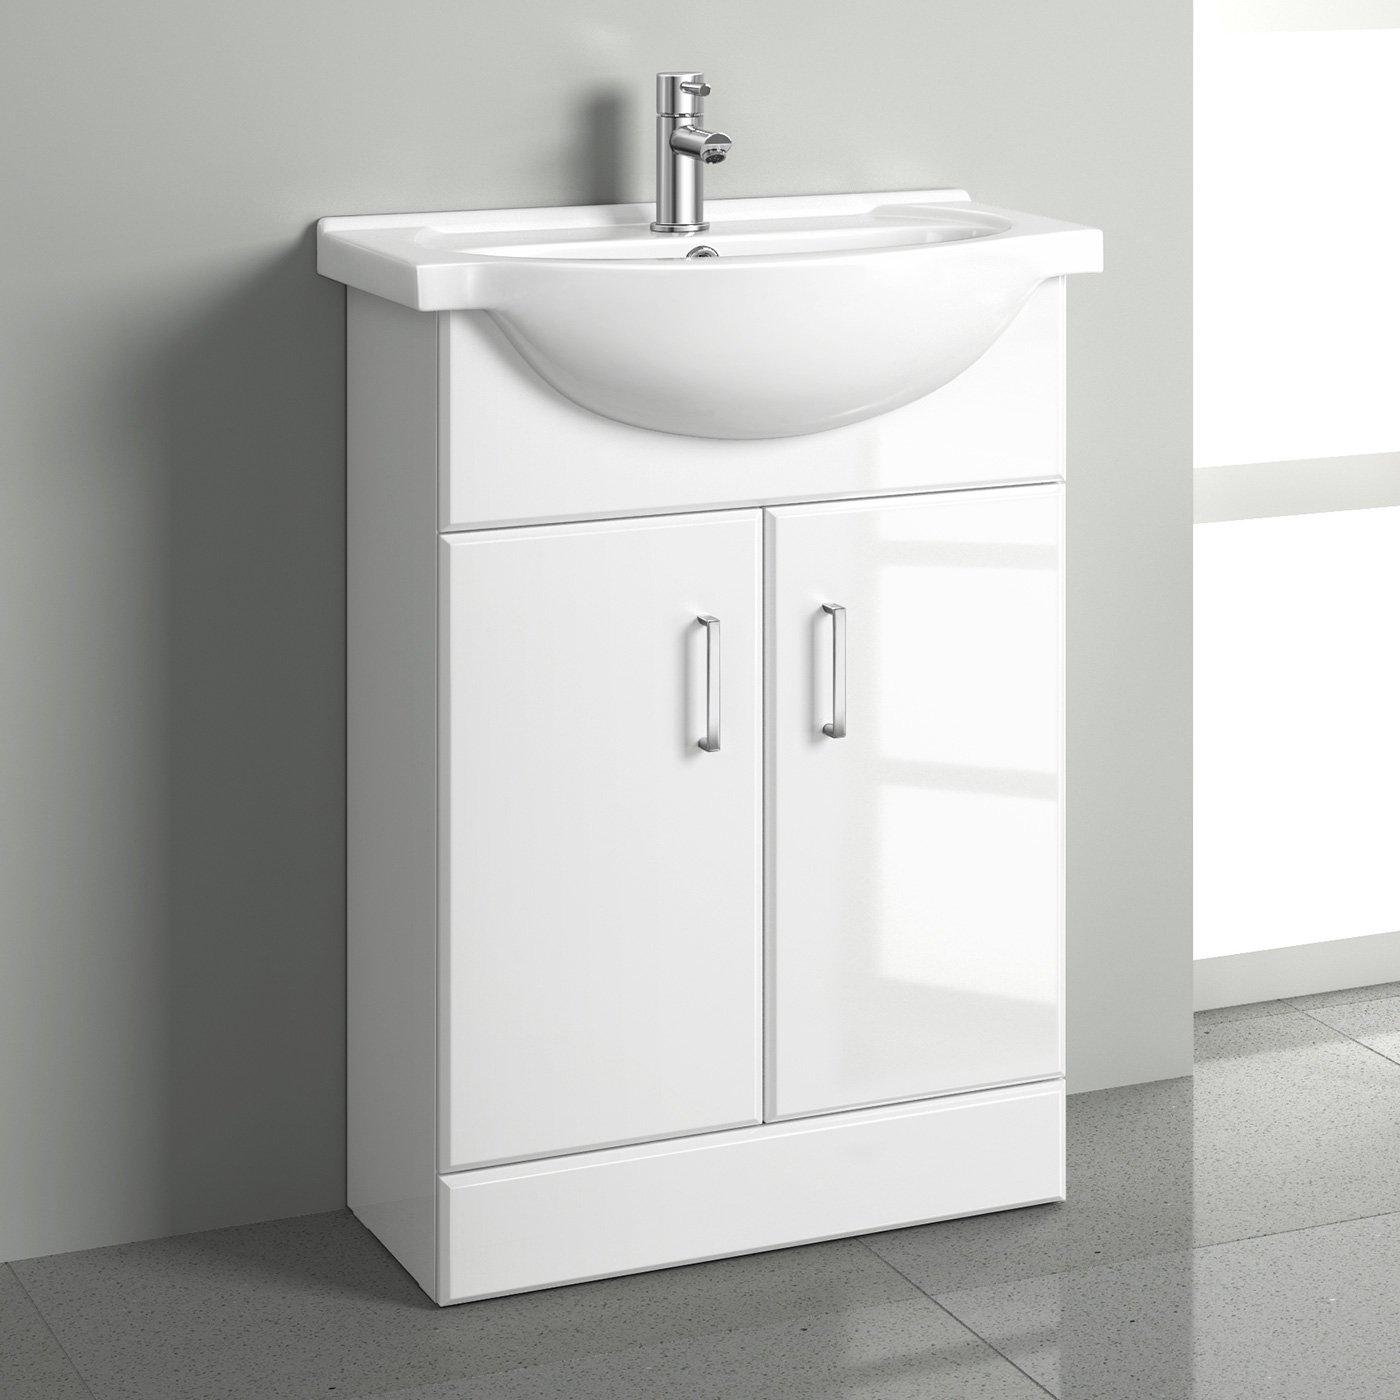 550mm White Gloss Basin Vanity Cabinet Bathroom Storage Furniture Sink Unit iBathUK